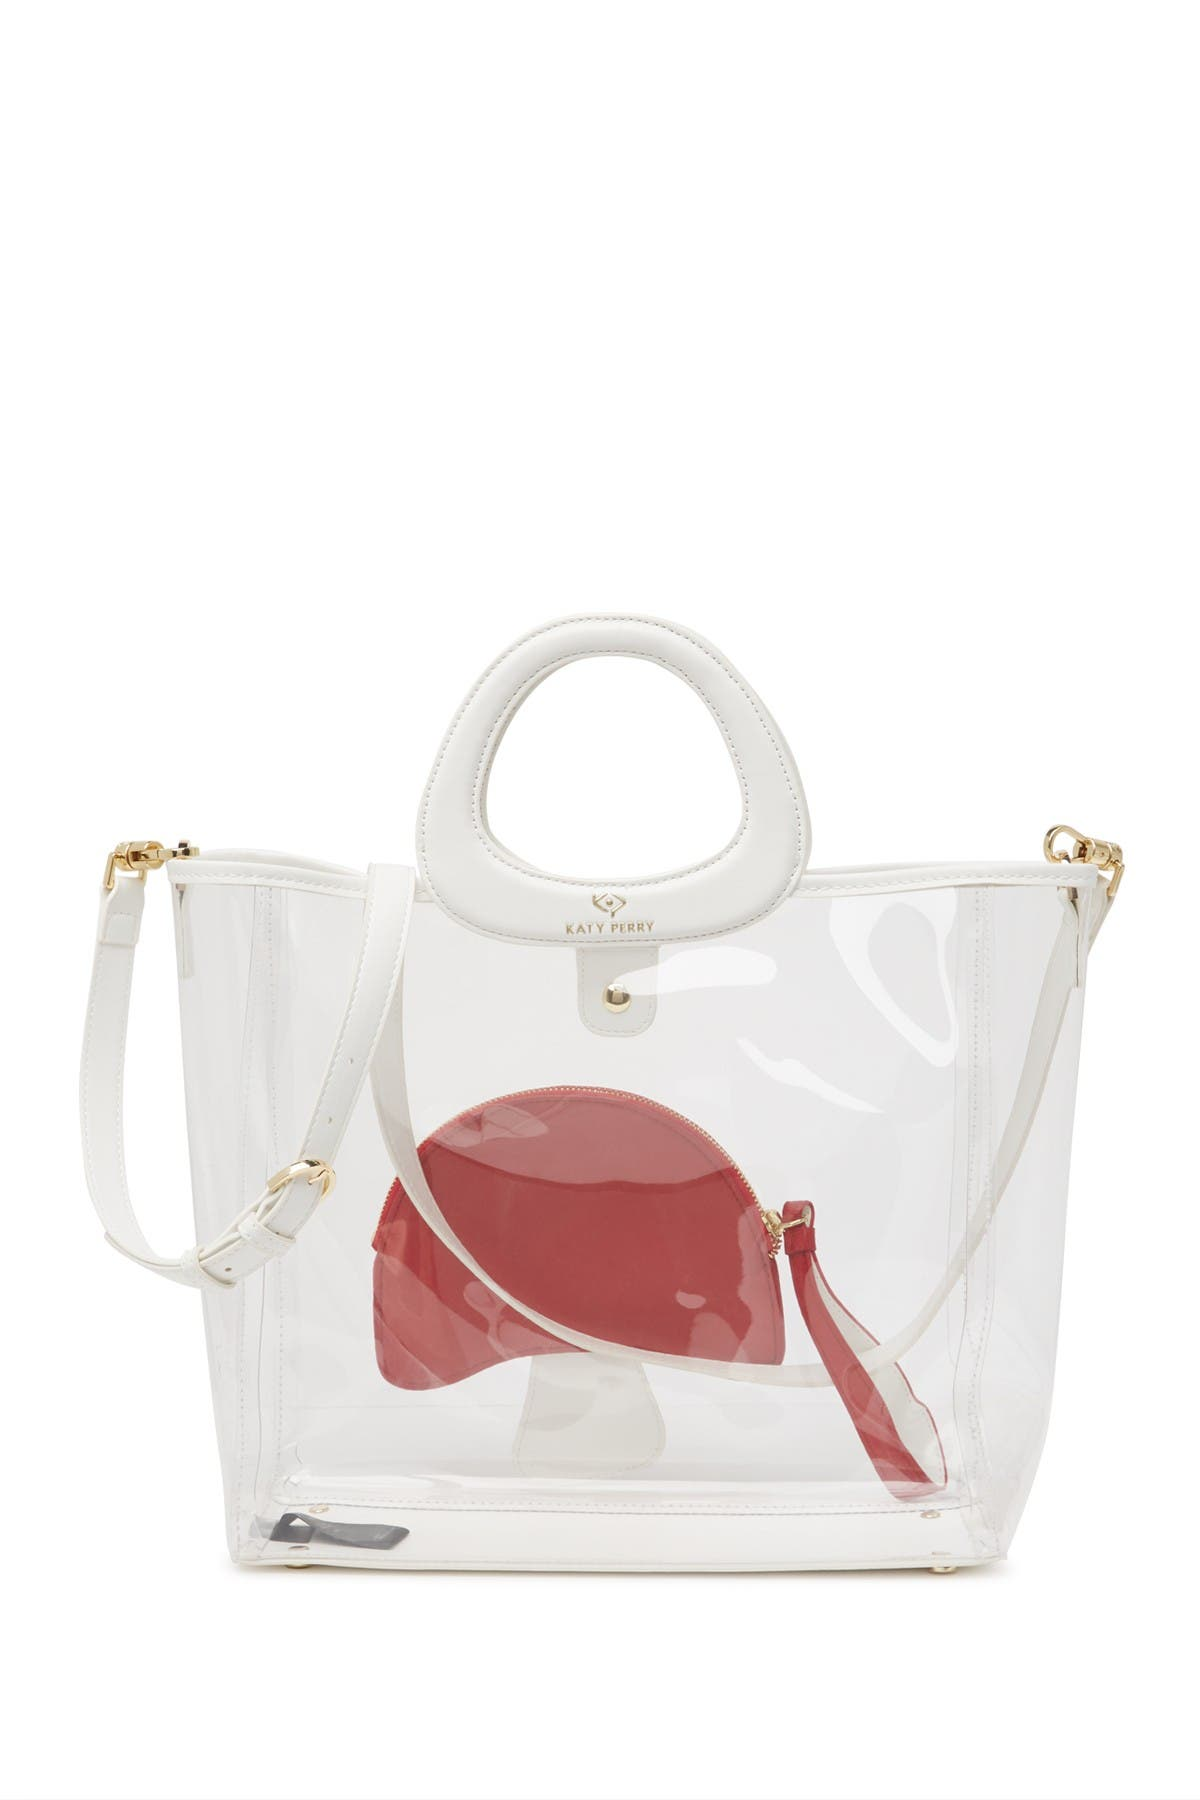 Image of Katy Perry Waves Mushroom Geli Transparent Wristlet Grab Bag